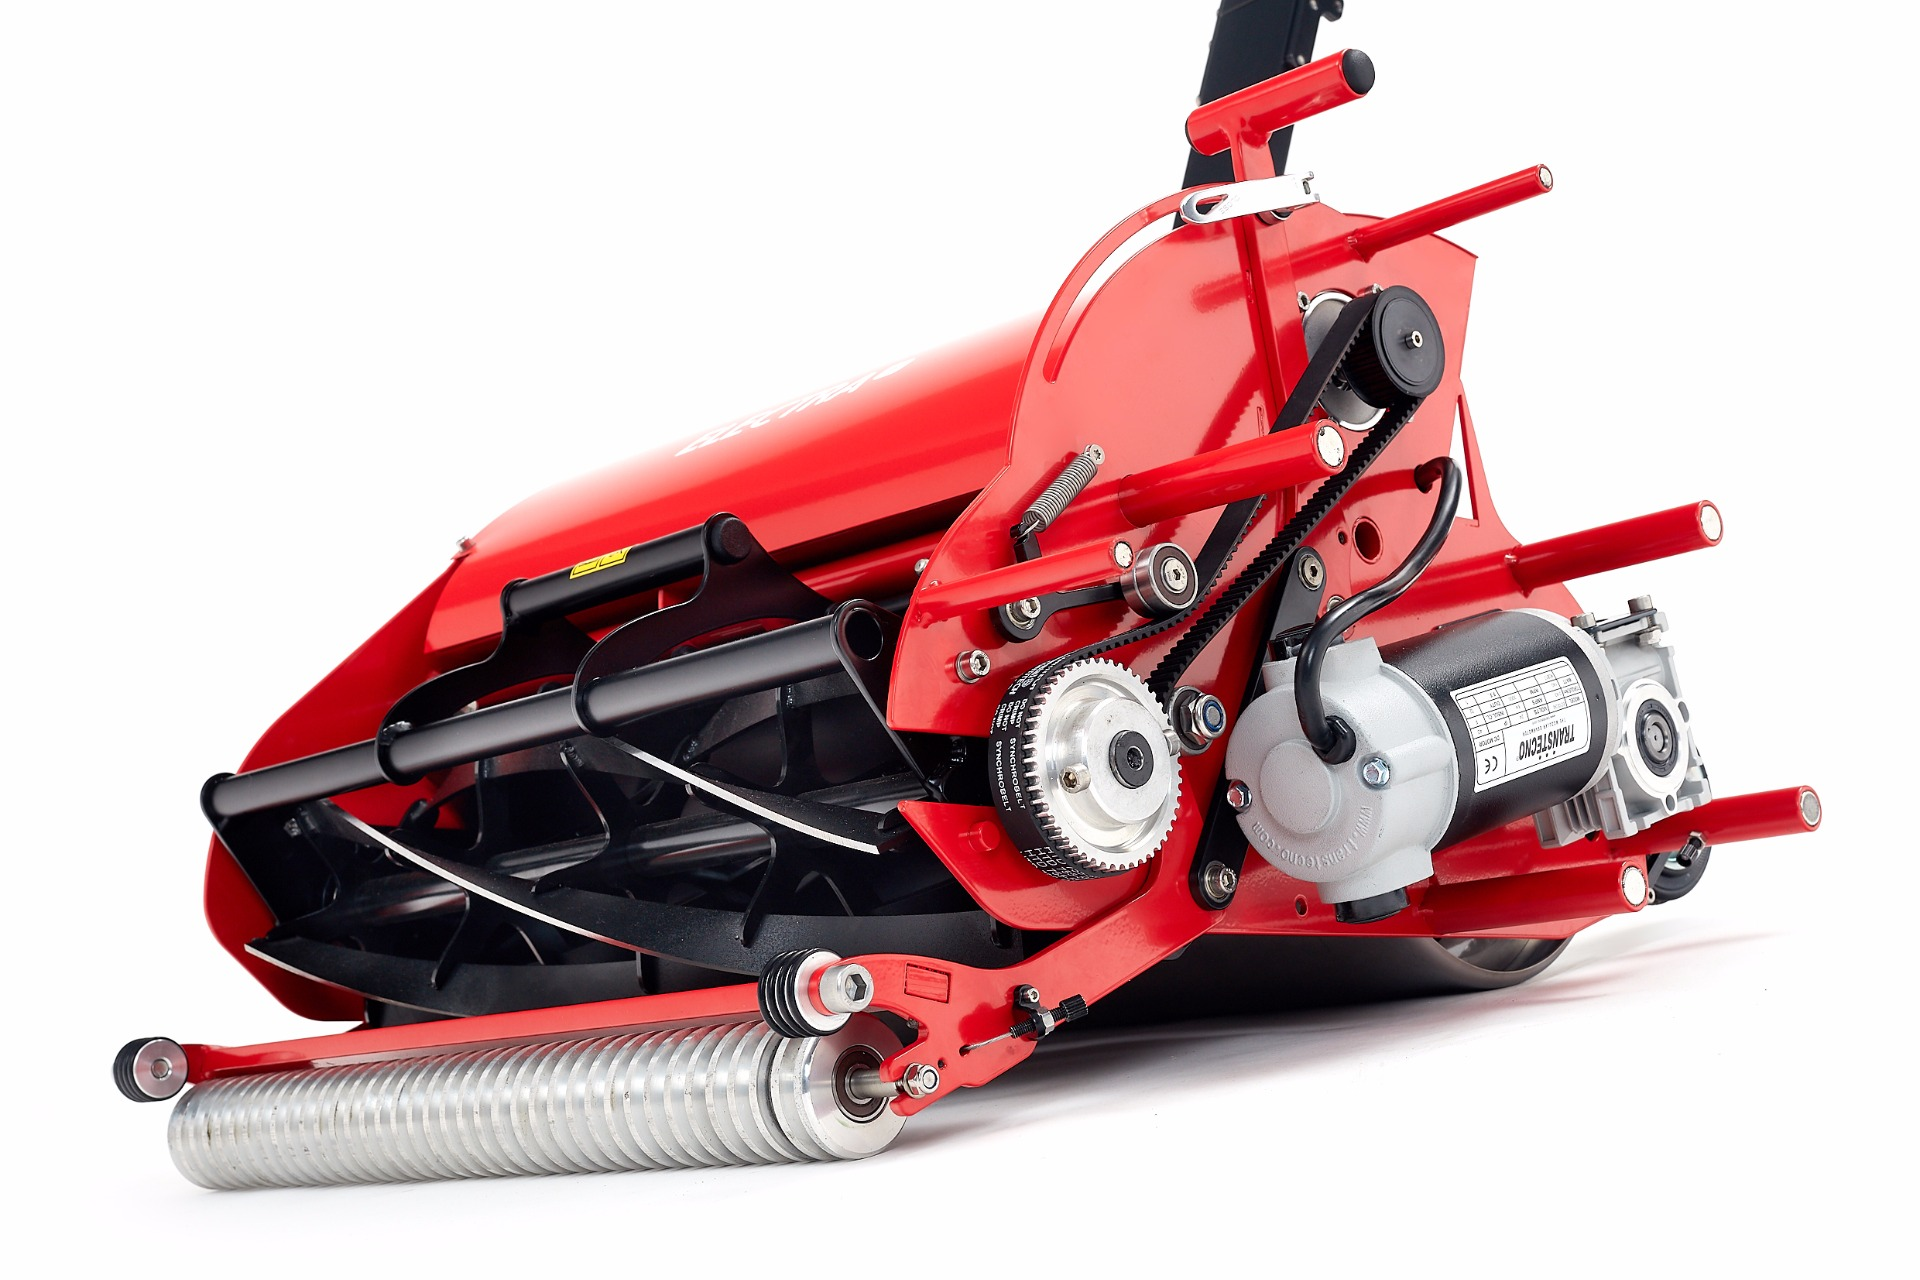 accu cordless model Electra silent lawn mower